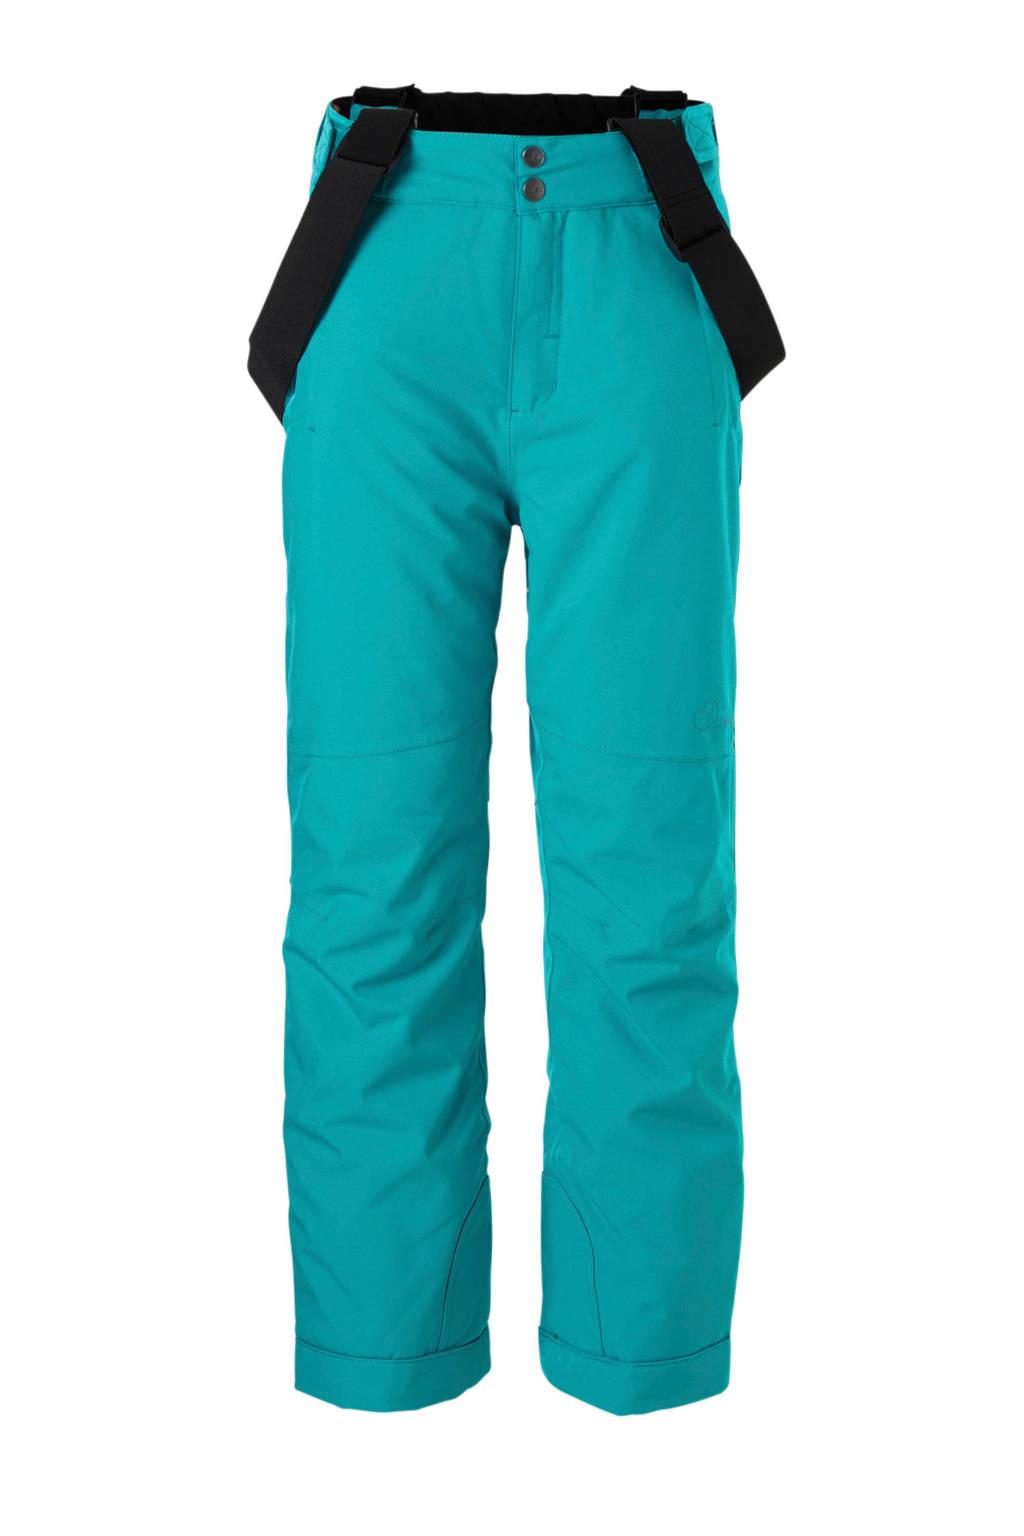 Dare2B skibroek turquoise, Turquoise